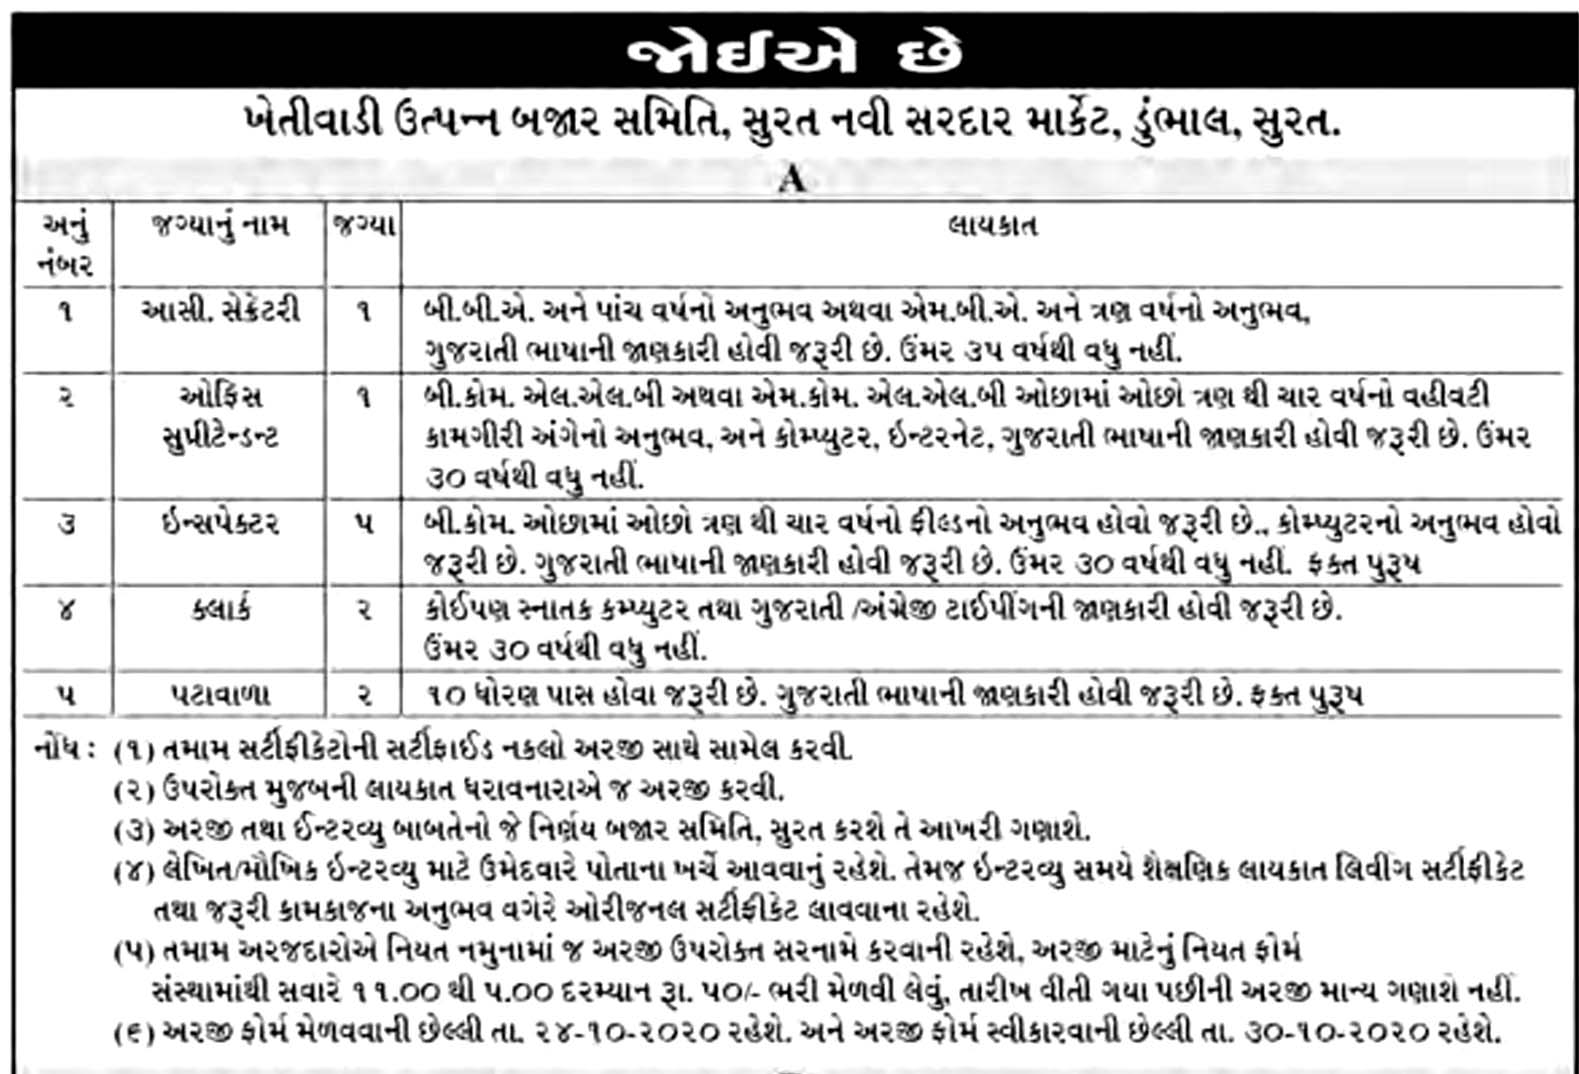 Khetivadi Utpanna Bazar Samiti, Surat Recruitment For Clerk,Peon And Other Posts 2020